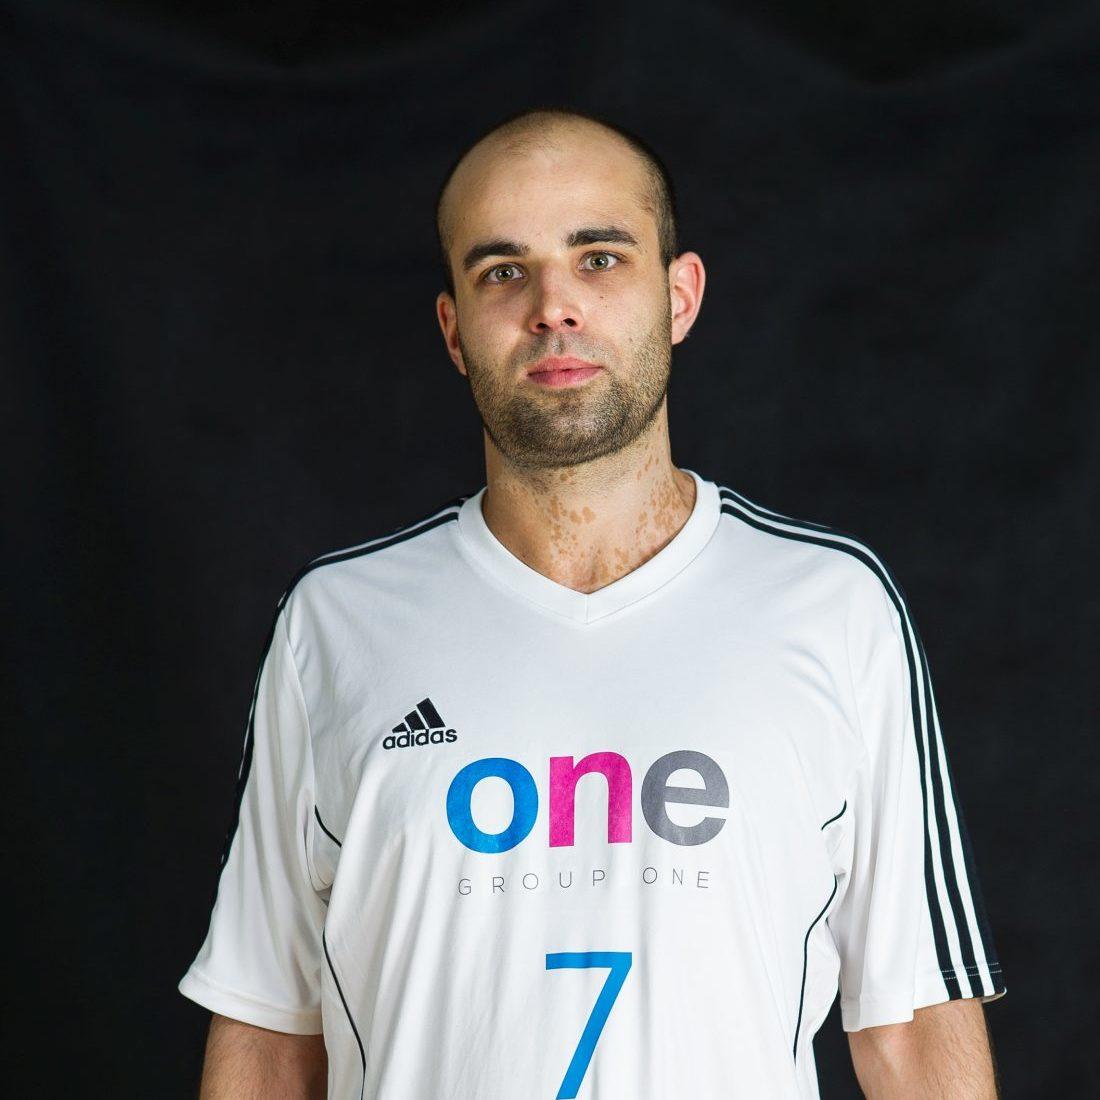 Filip Piecyk